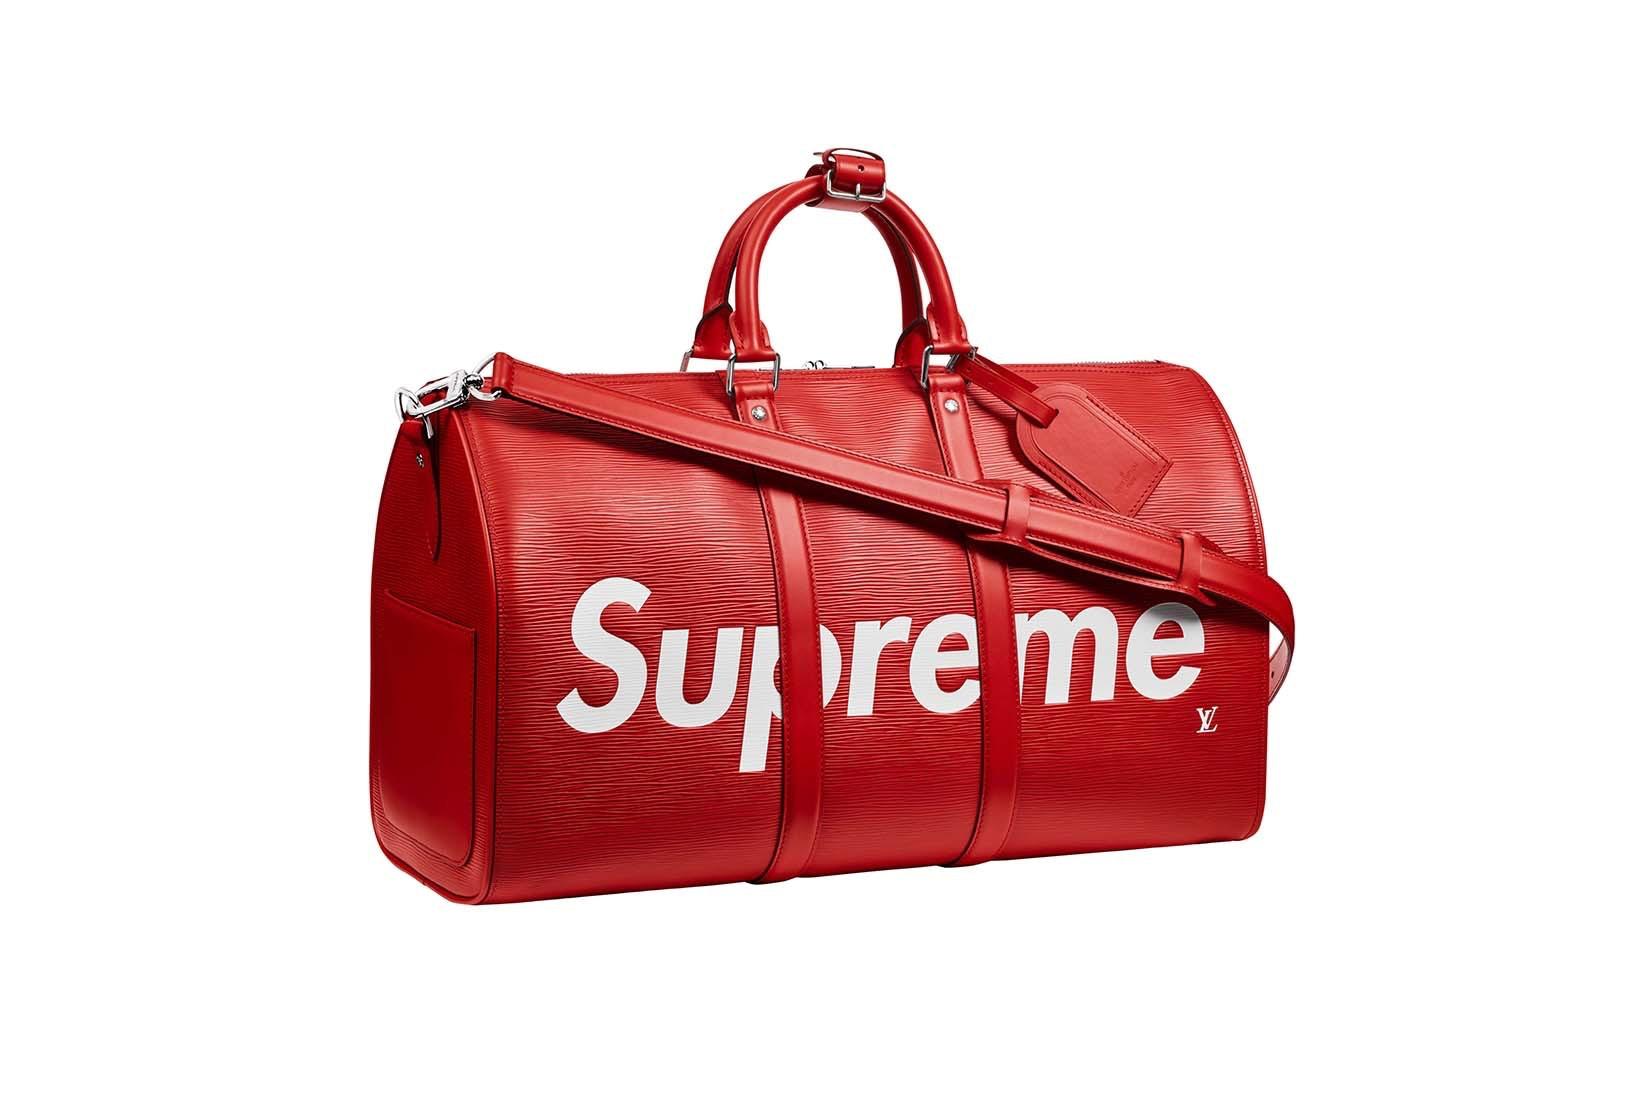 Supreme(シュプリーム)×Louis Vuitton(ルイ・ヴィトン) / キーポル 45(Keepall 45)